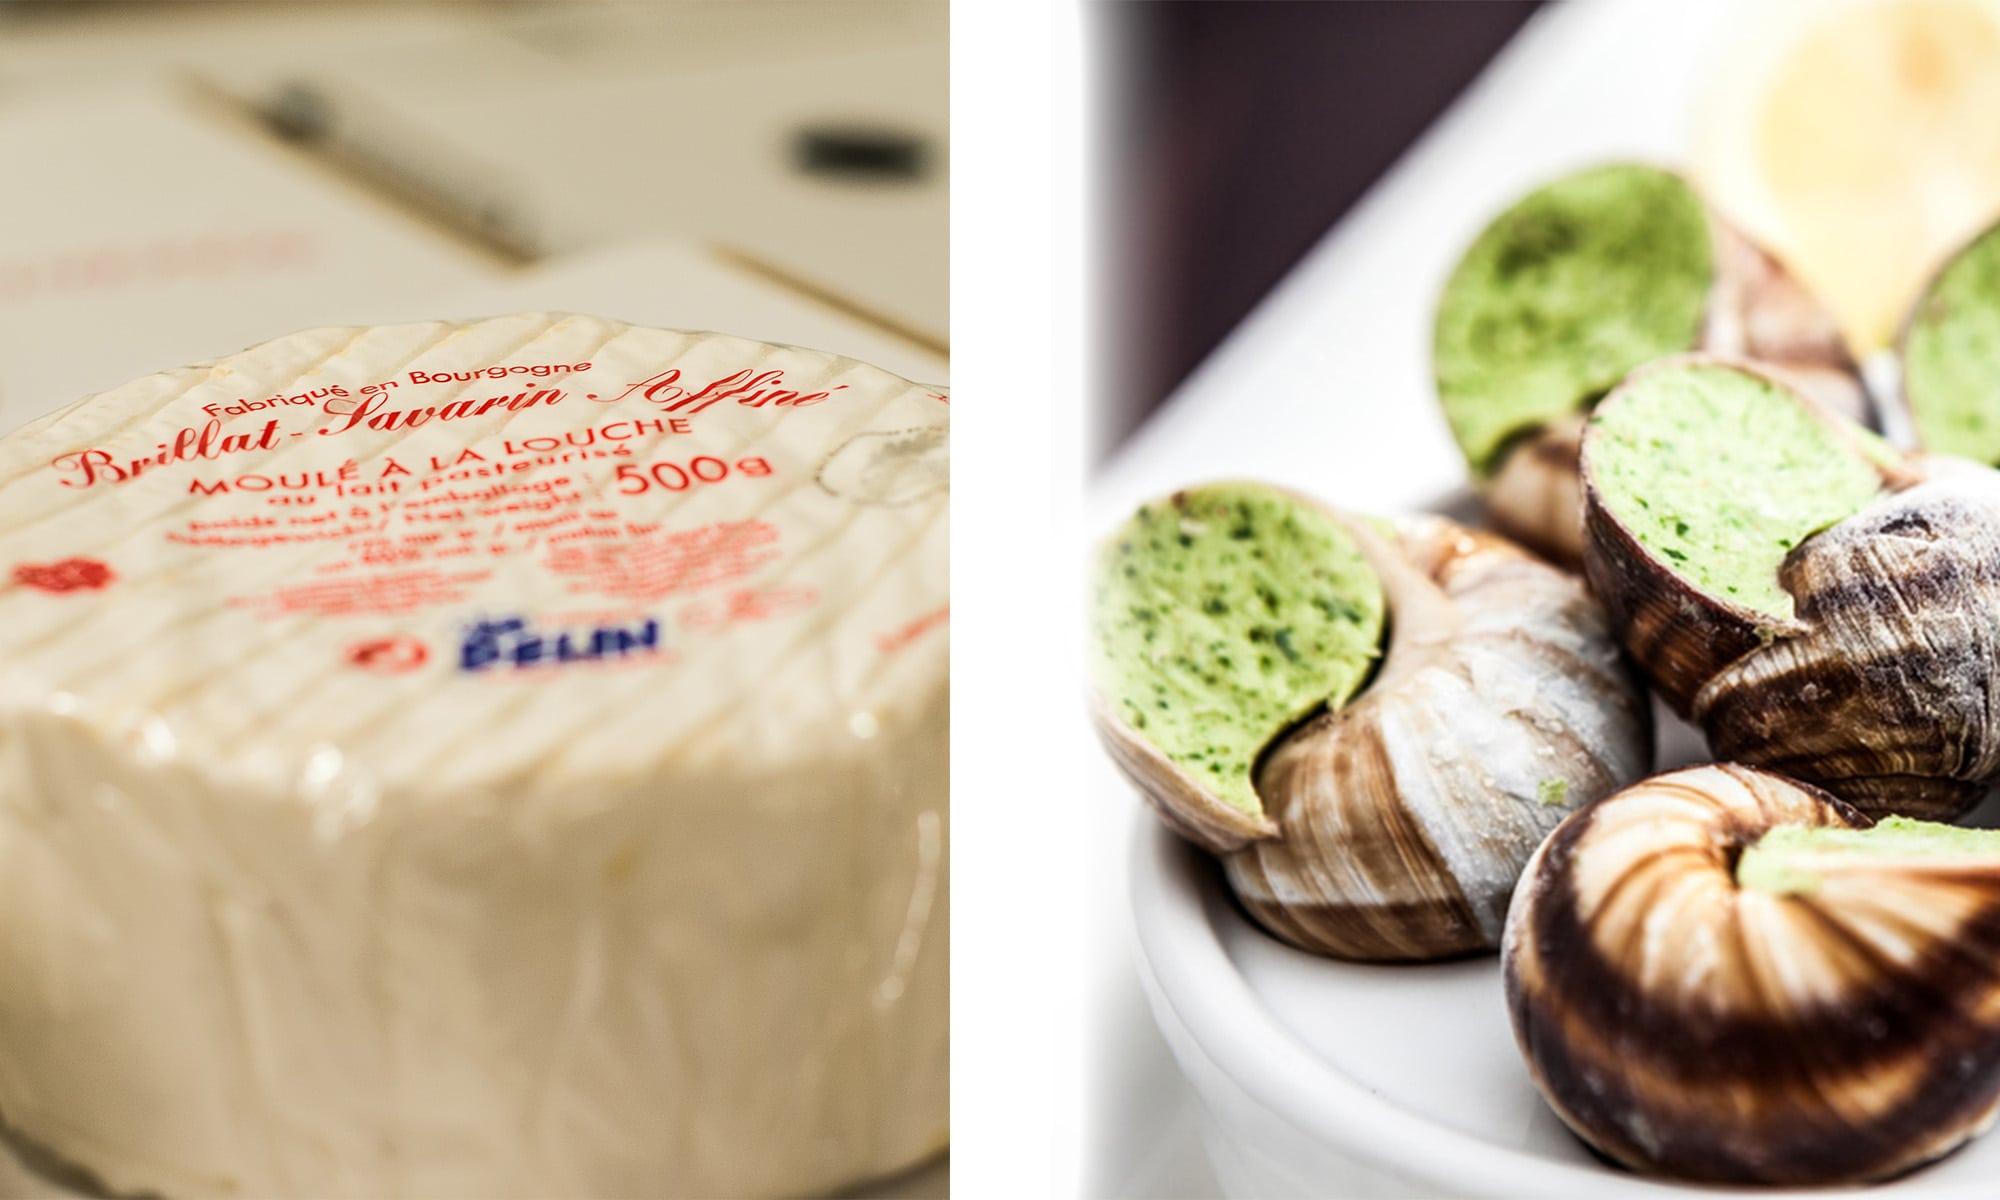 Fricassée d'escargots de Bourgogne au Brillat-Savarin